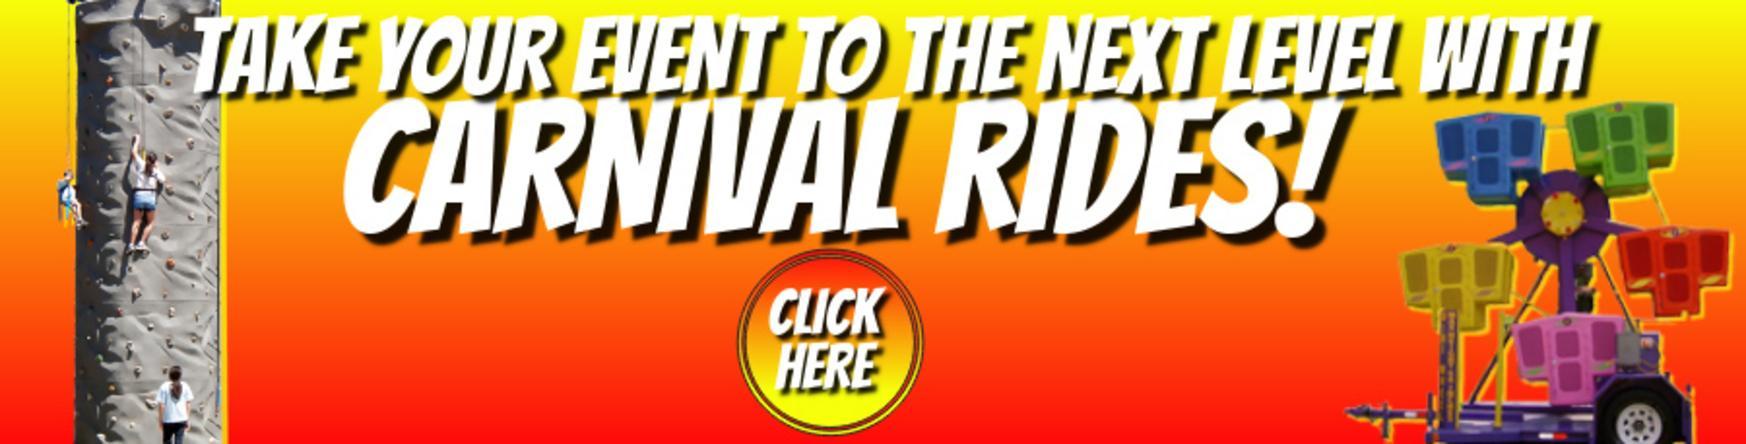 carnival ride rentals Austin